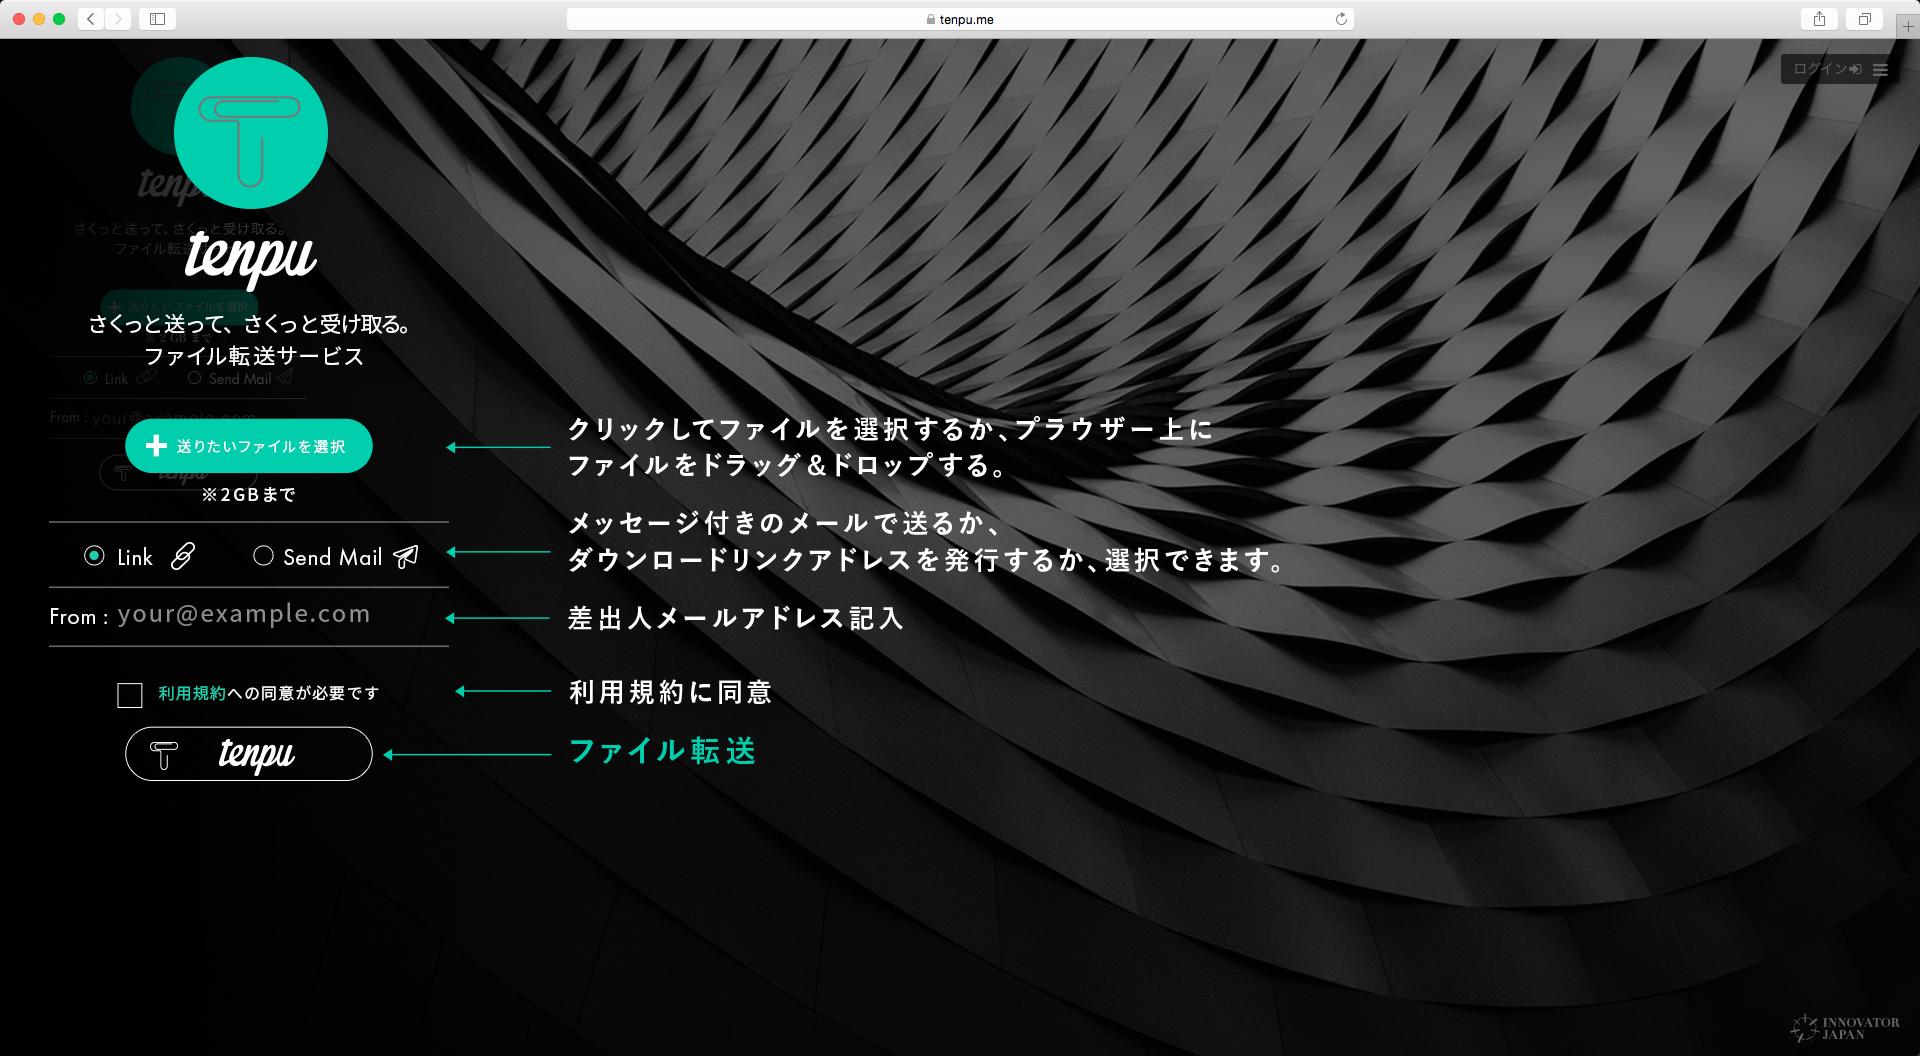 tenpu_usage001